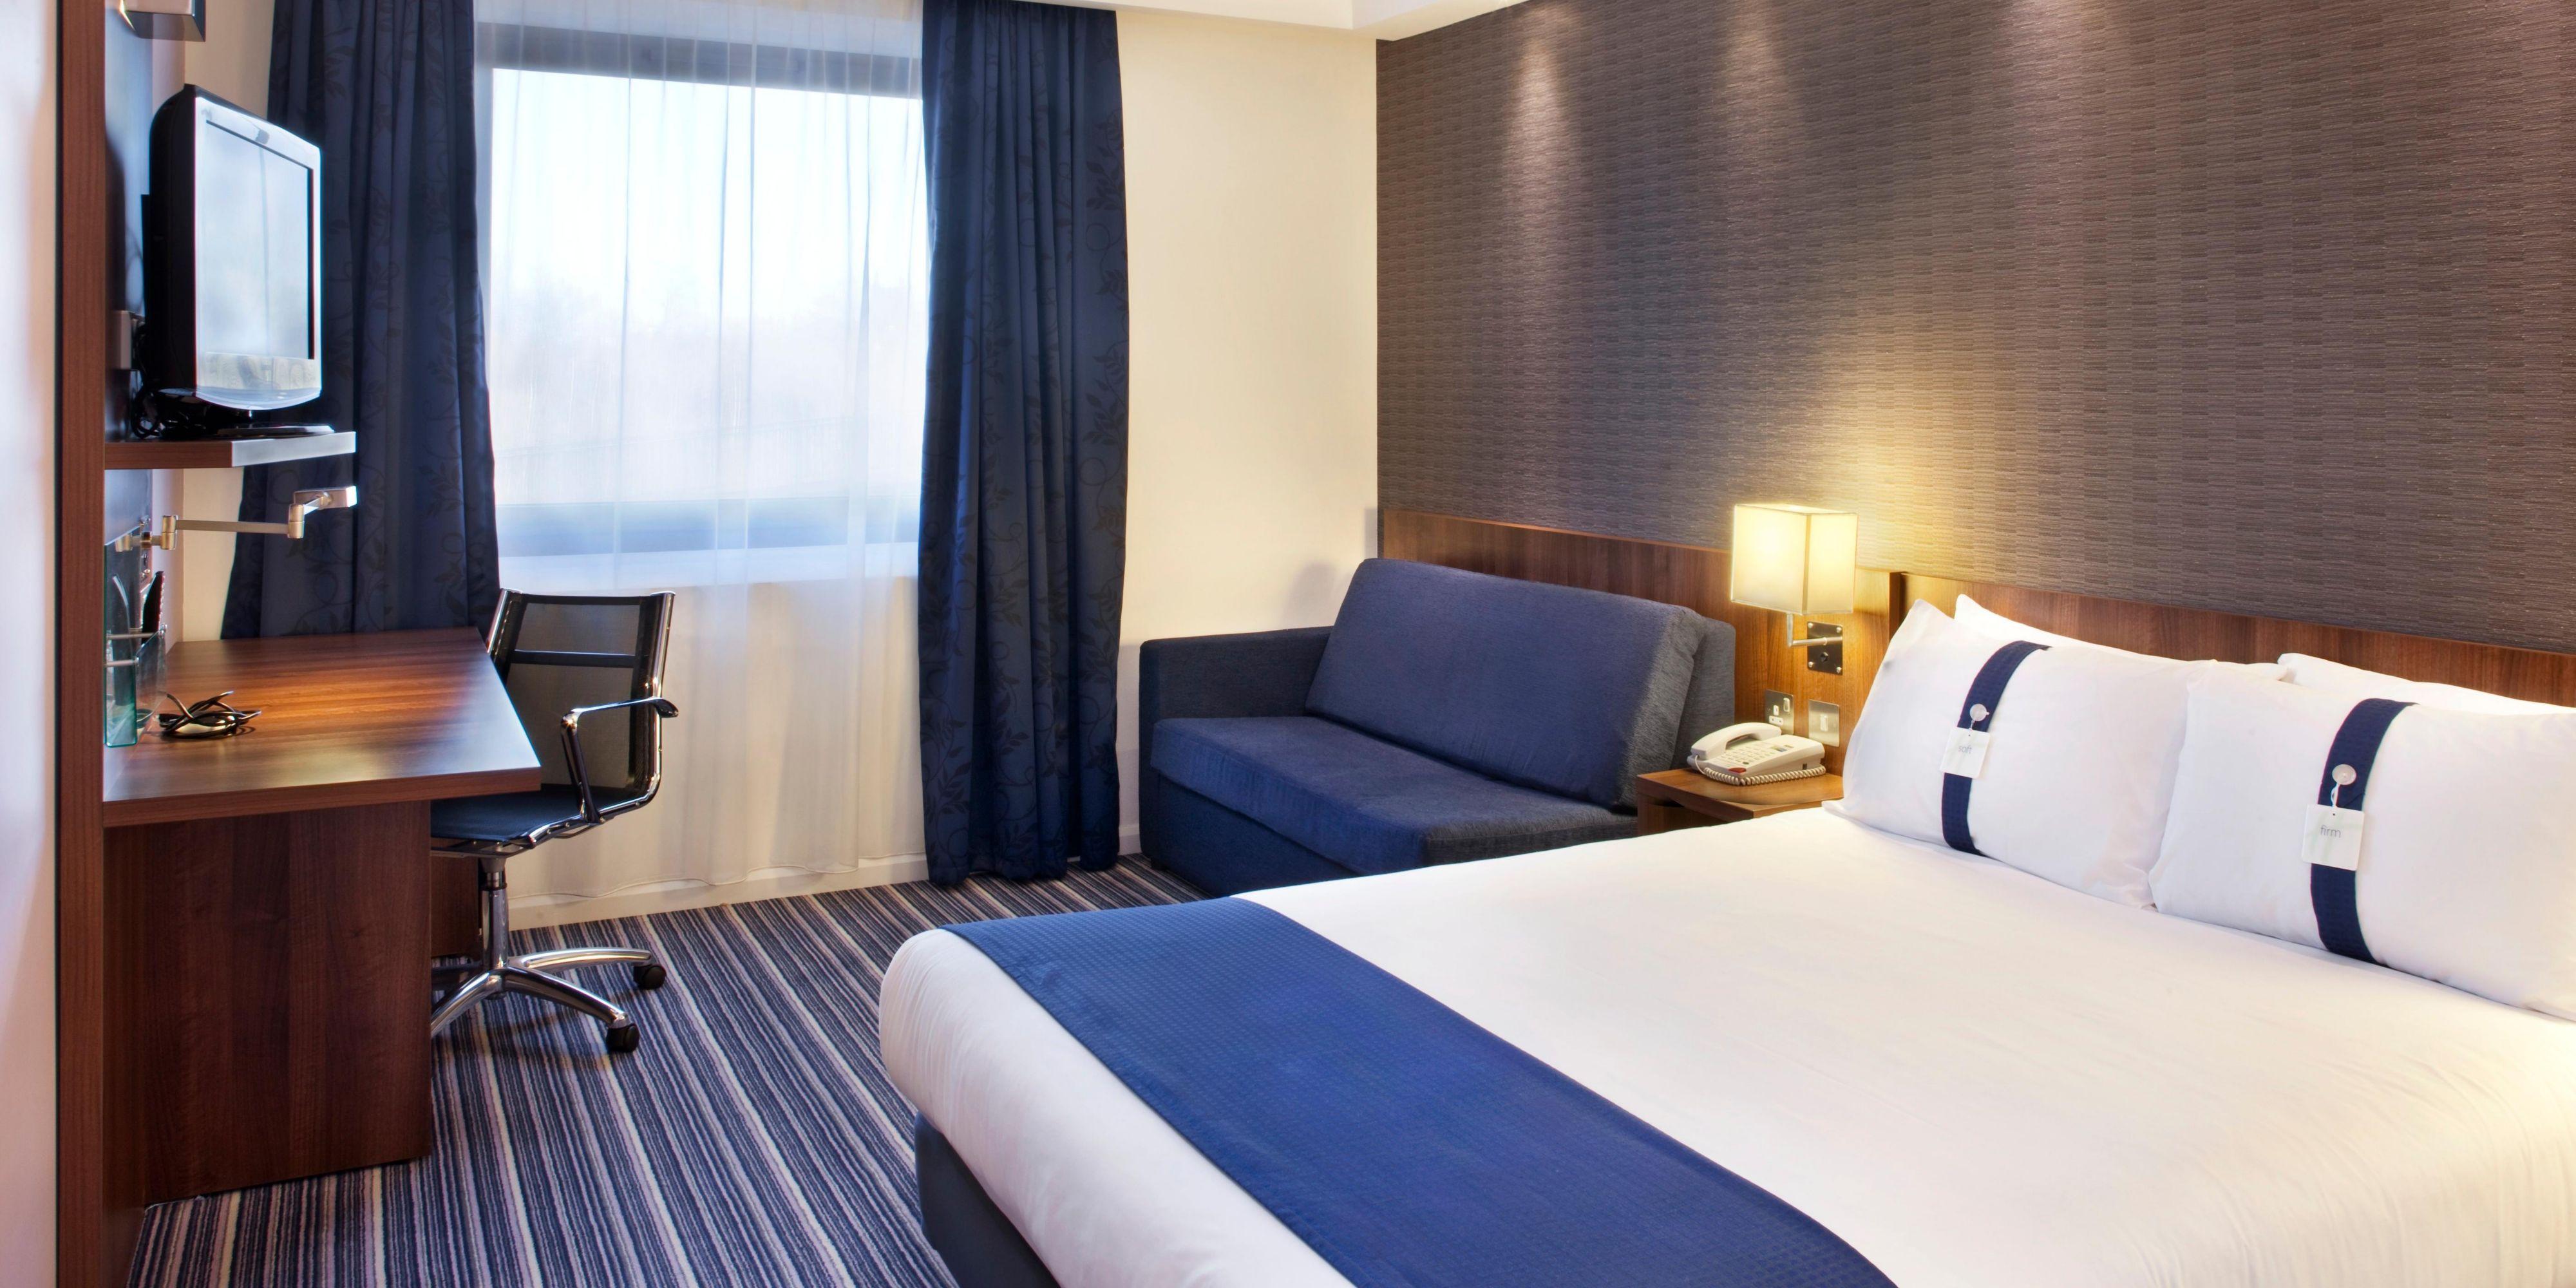 Holiday Inn Express Tamworth 3951041480 2x1